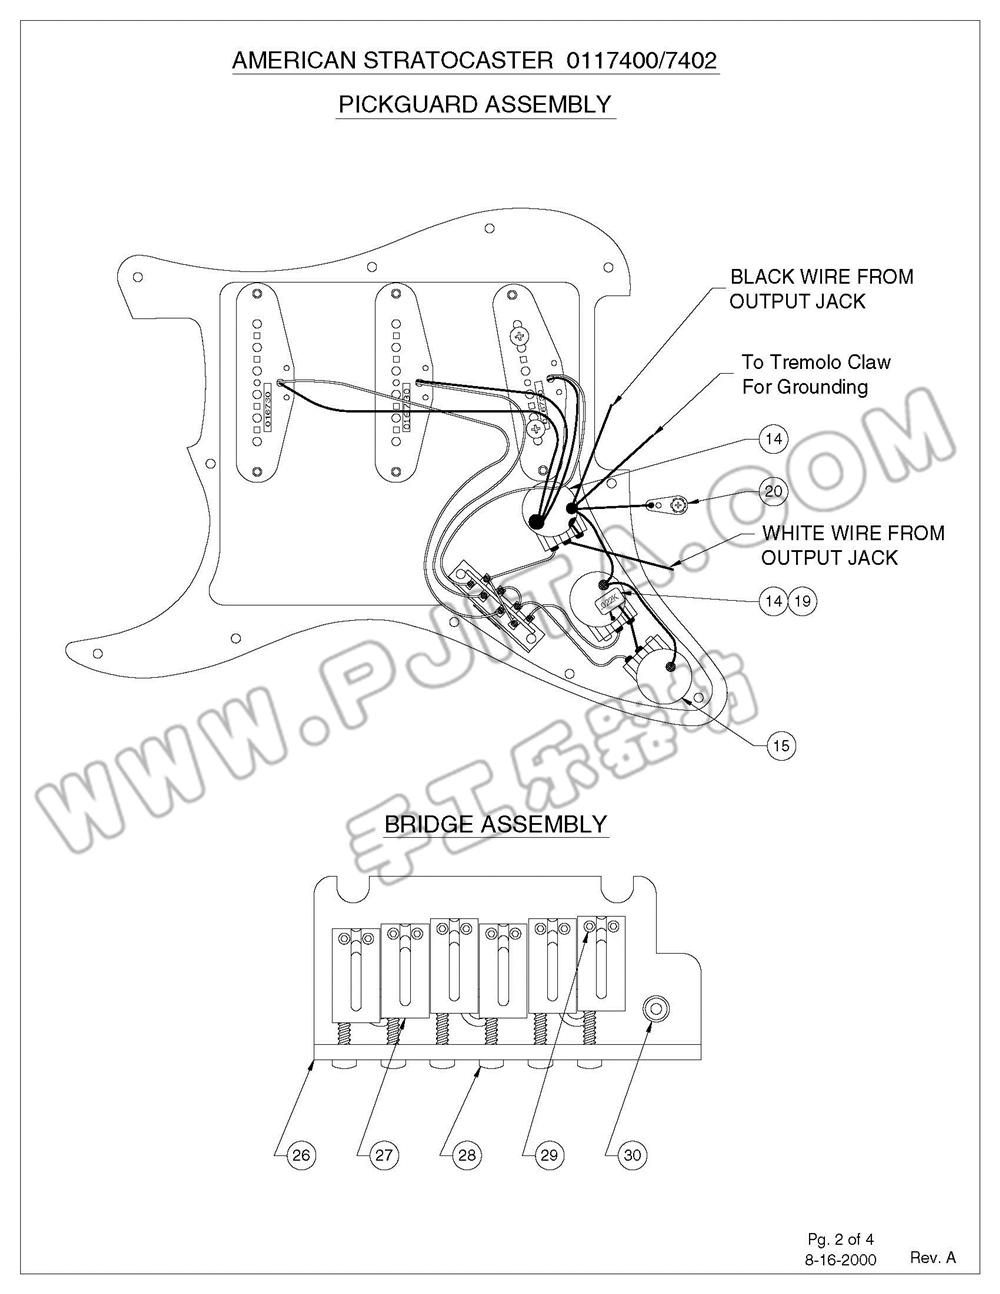 fender usa 011 系列 stratocaster 电路图最全集合之